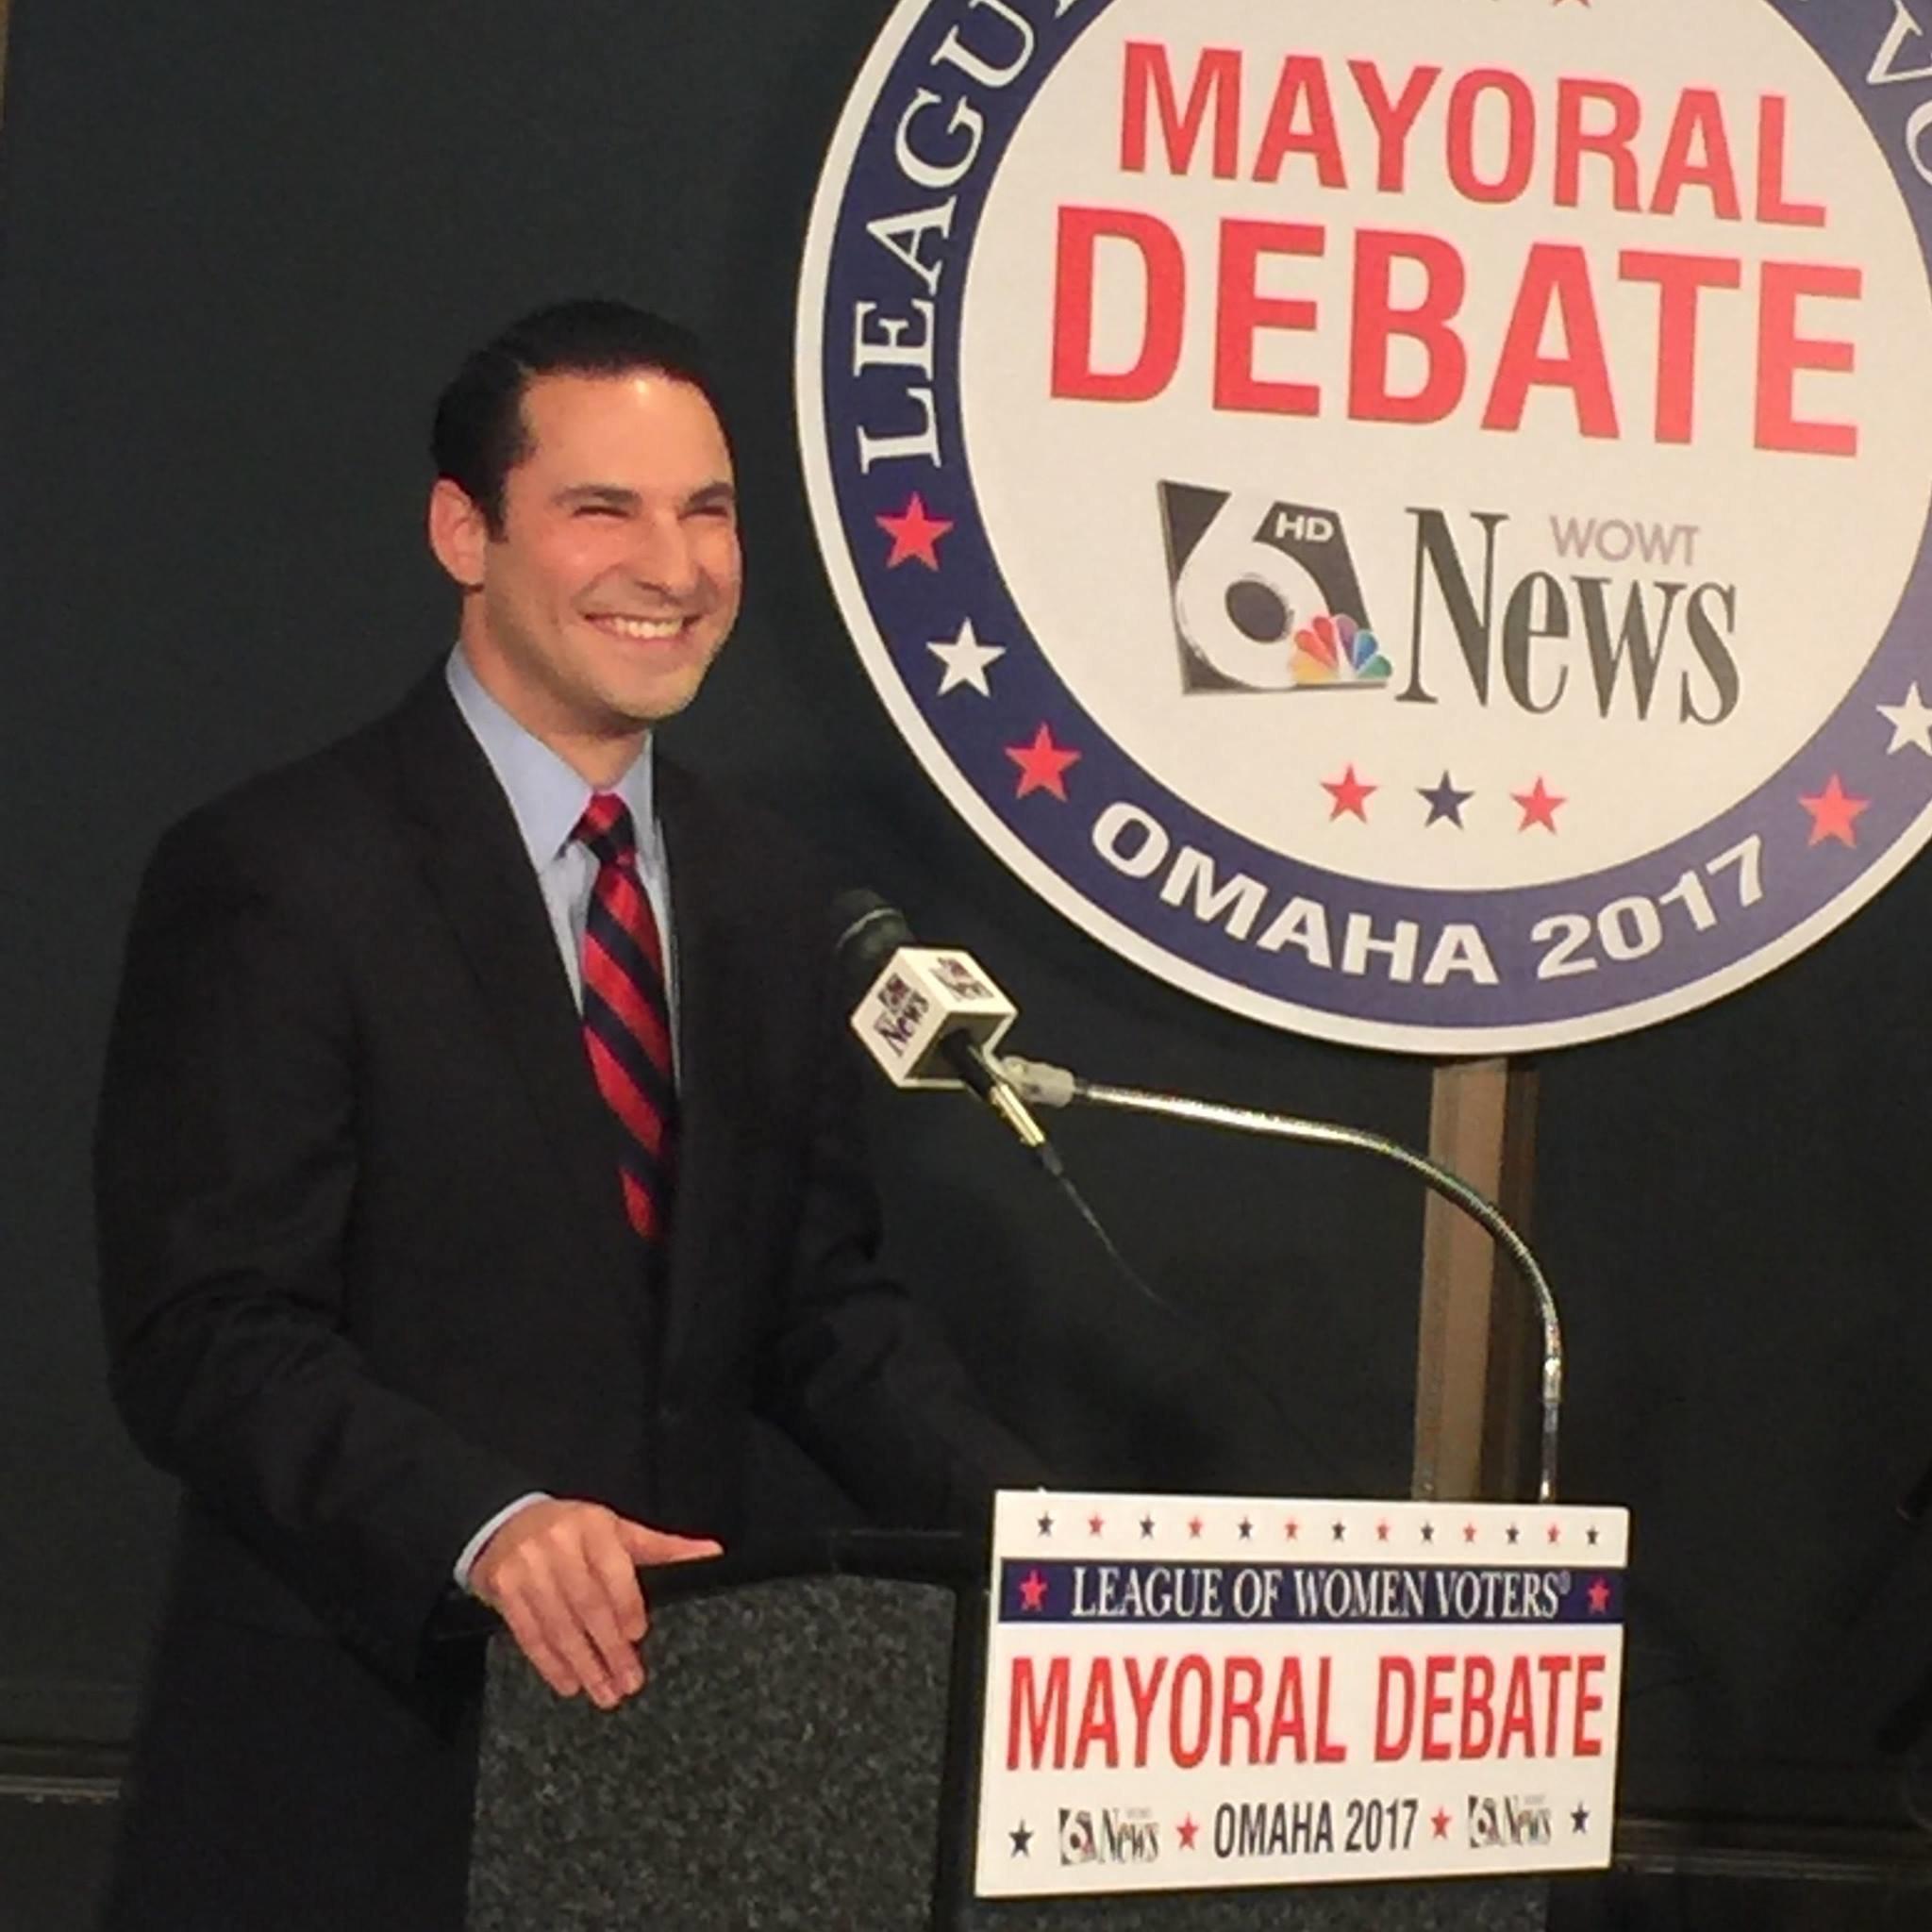 Democrat Heath Mello fell short of defeating the Republican mayor of Omaha.